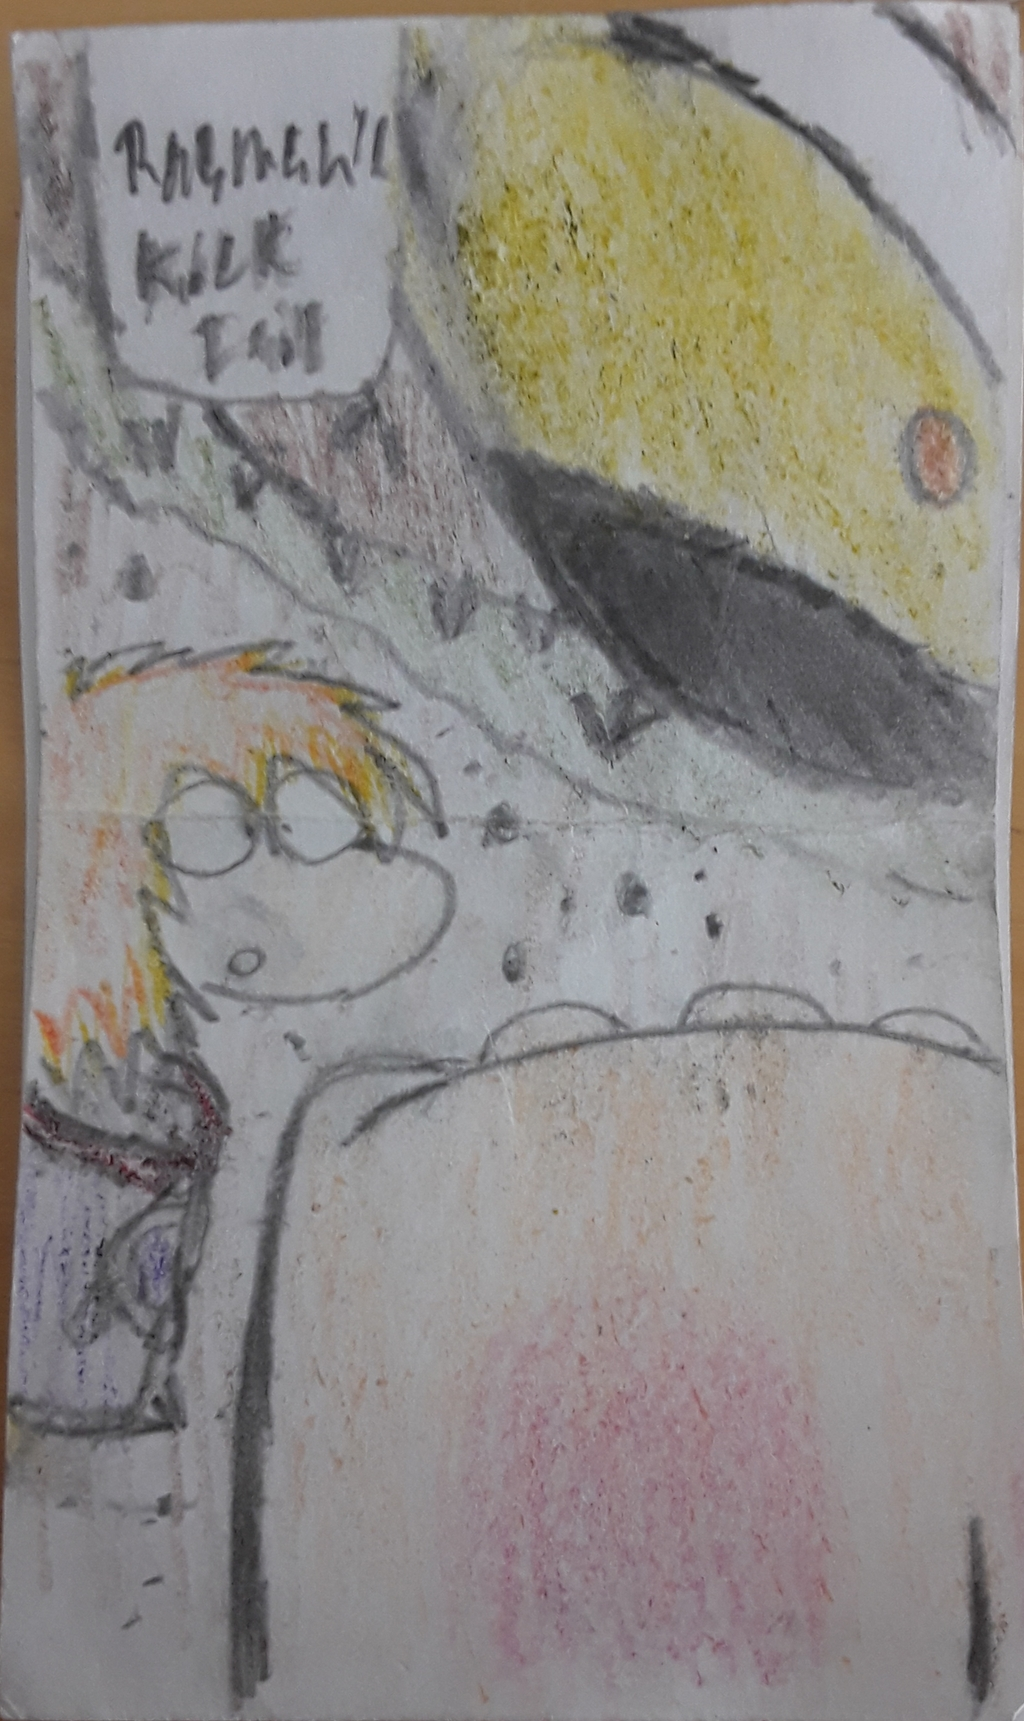 Rayman's kick fail (blush version)